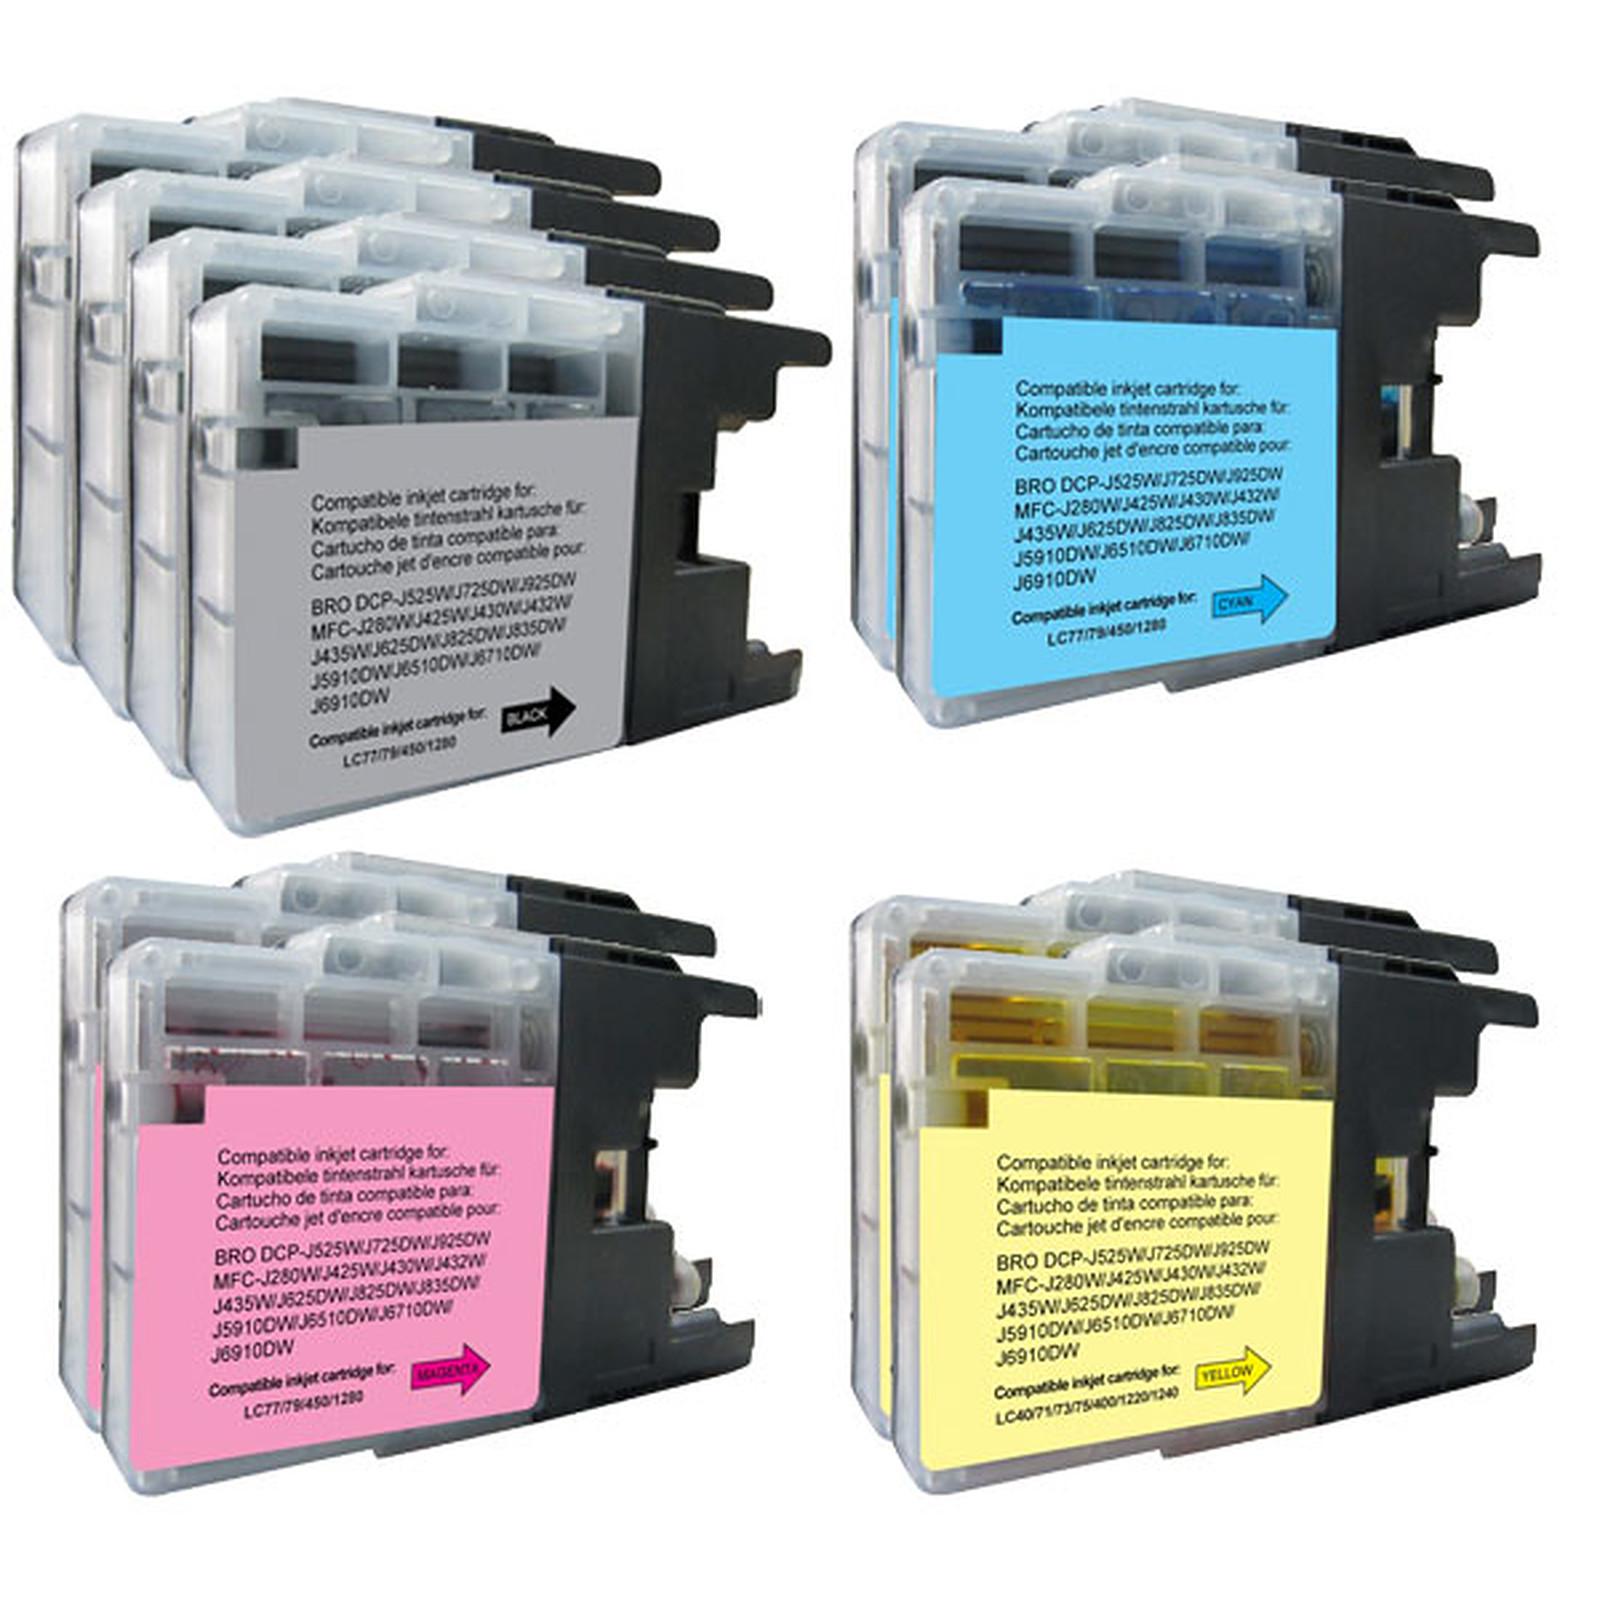 Megapack compatible Brother LC1280XL/1240/1220 (Noir, cyan, magenta et jaune)